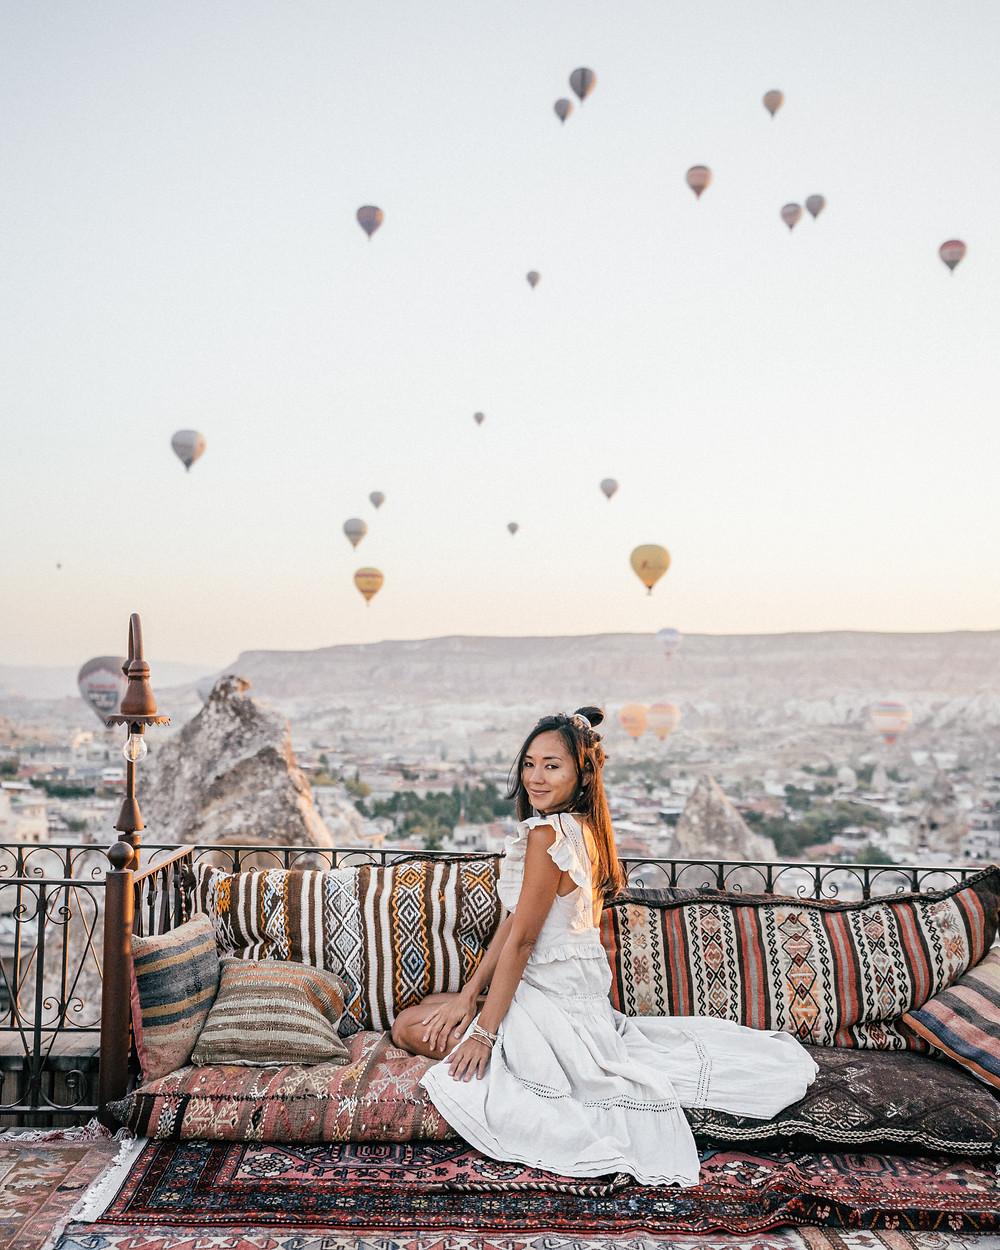 Koza Cave Hotel, Goreme, Cappadocia, Turkey